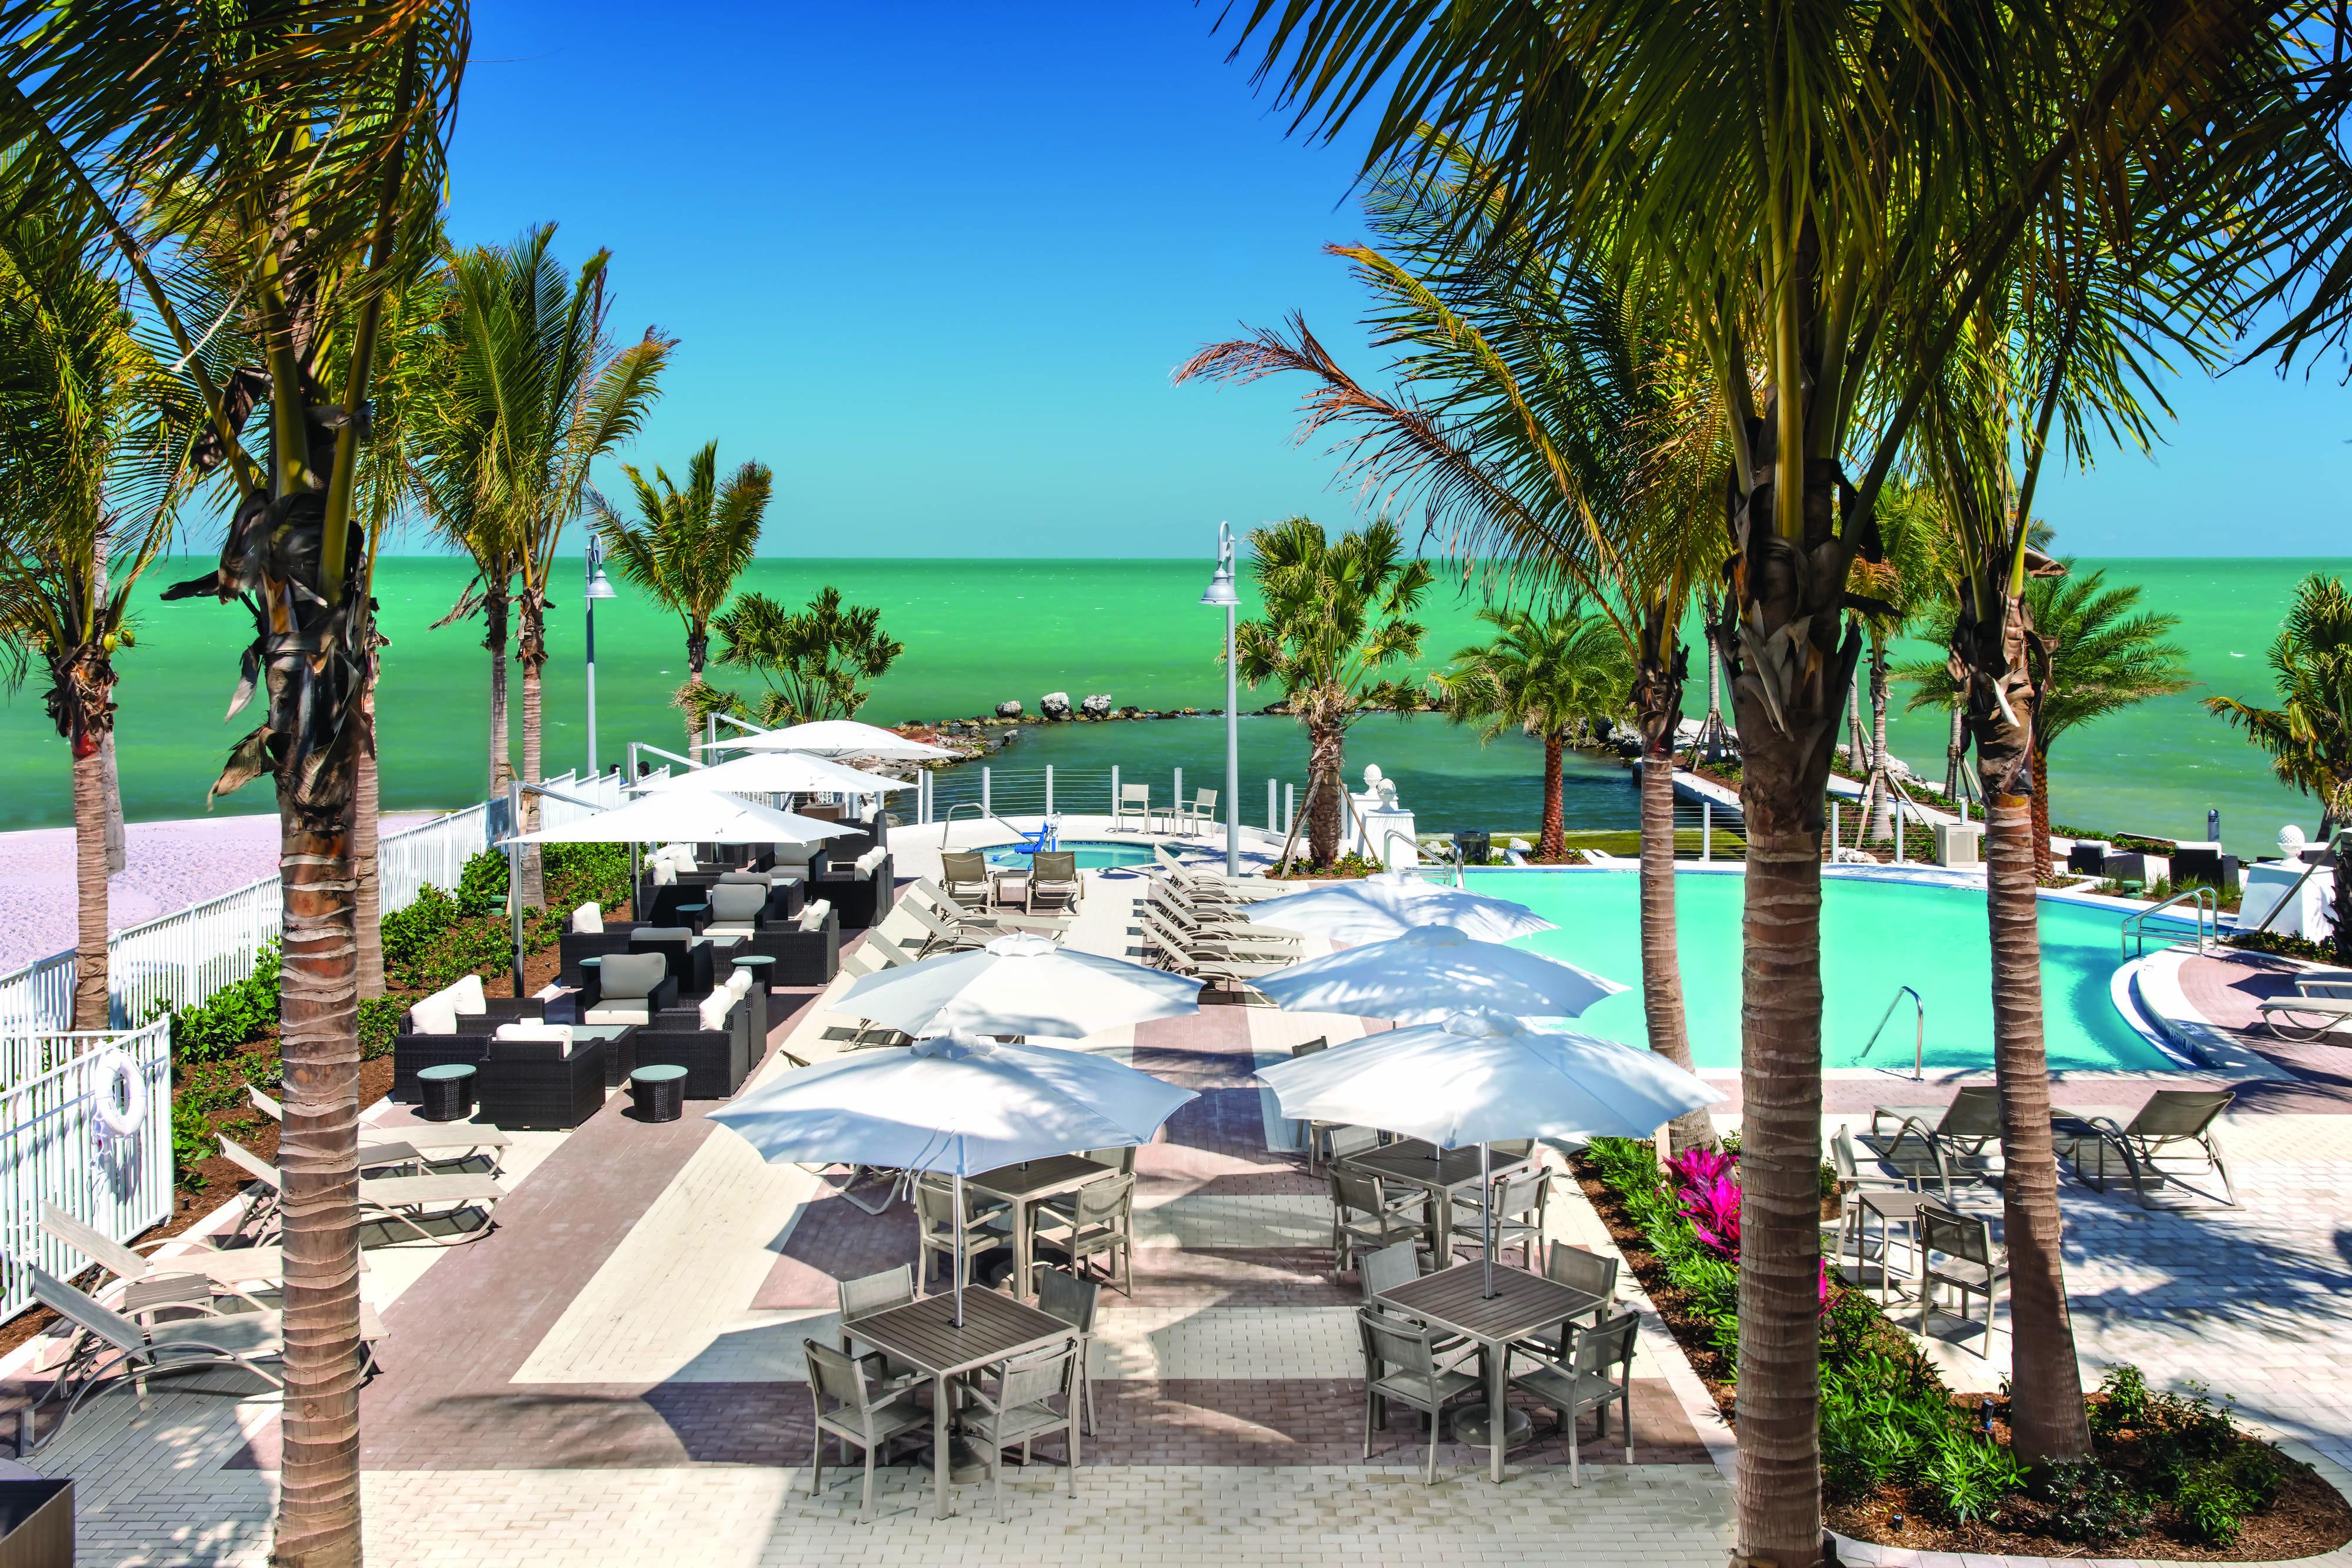 Courtyard Marathon Florida Keys Patio View Suite Beautiful Travel Florida Keys Hotels Beachfront Hotels Marathon Florida Keys